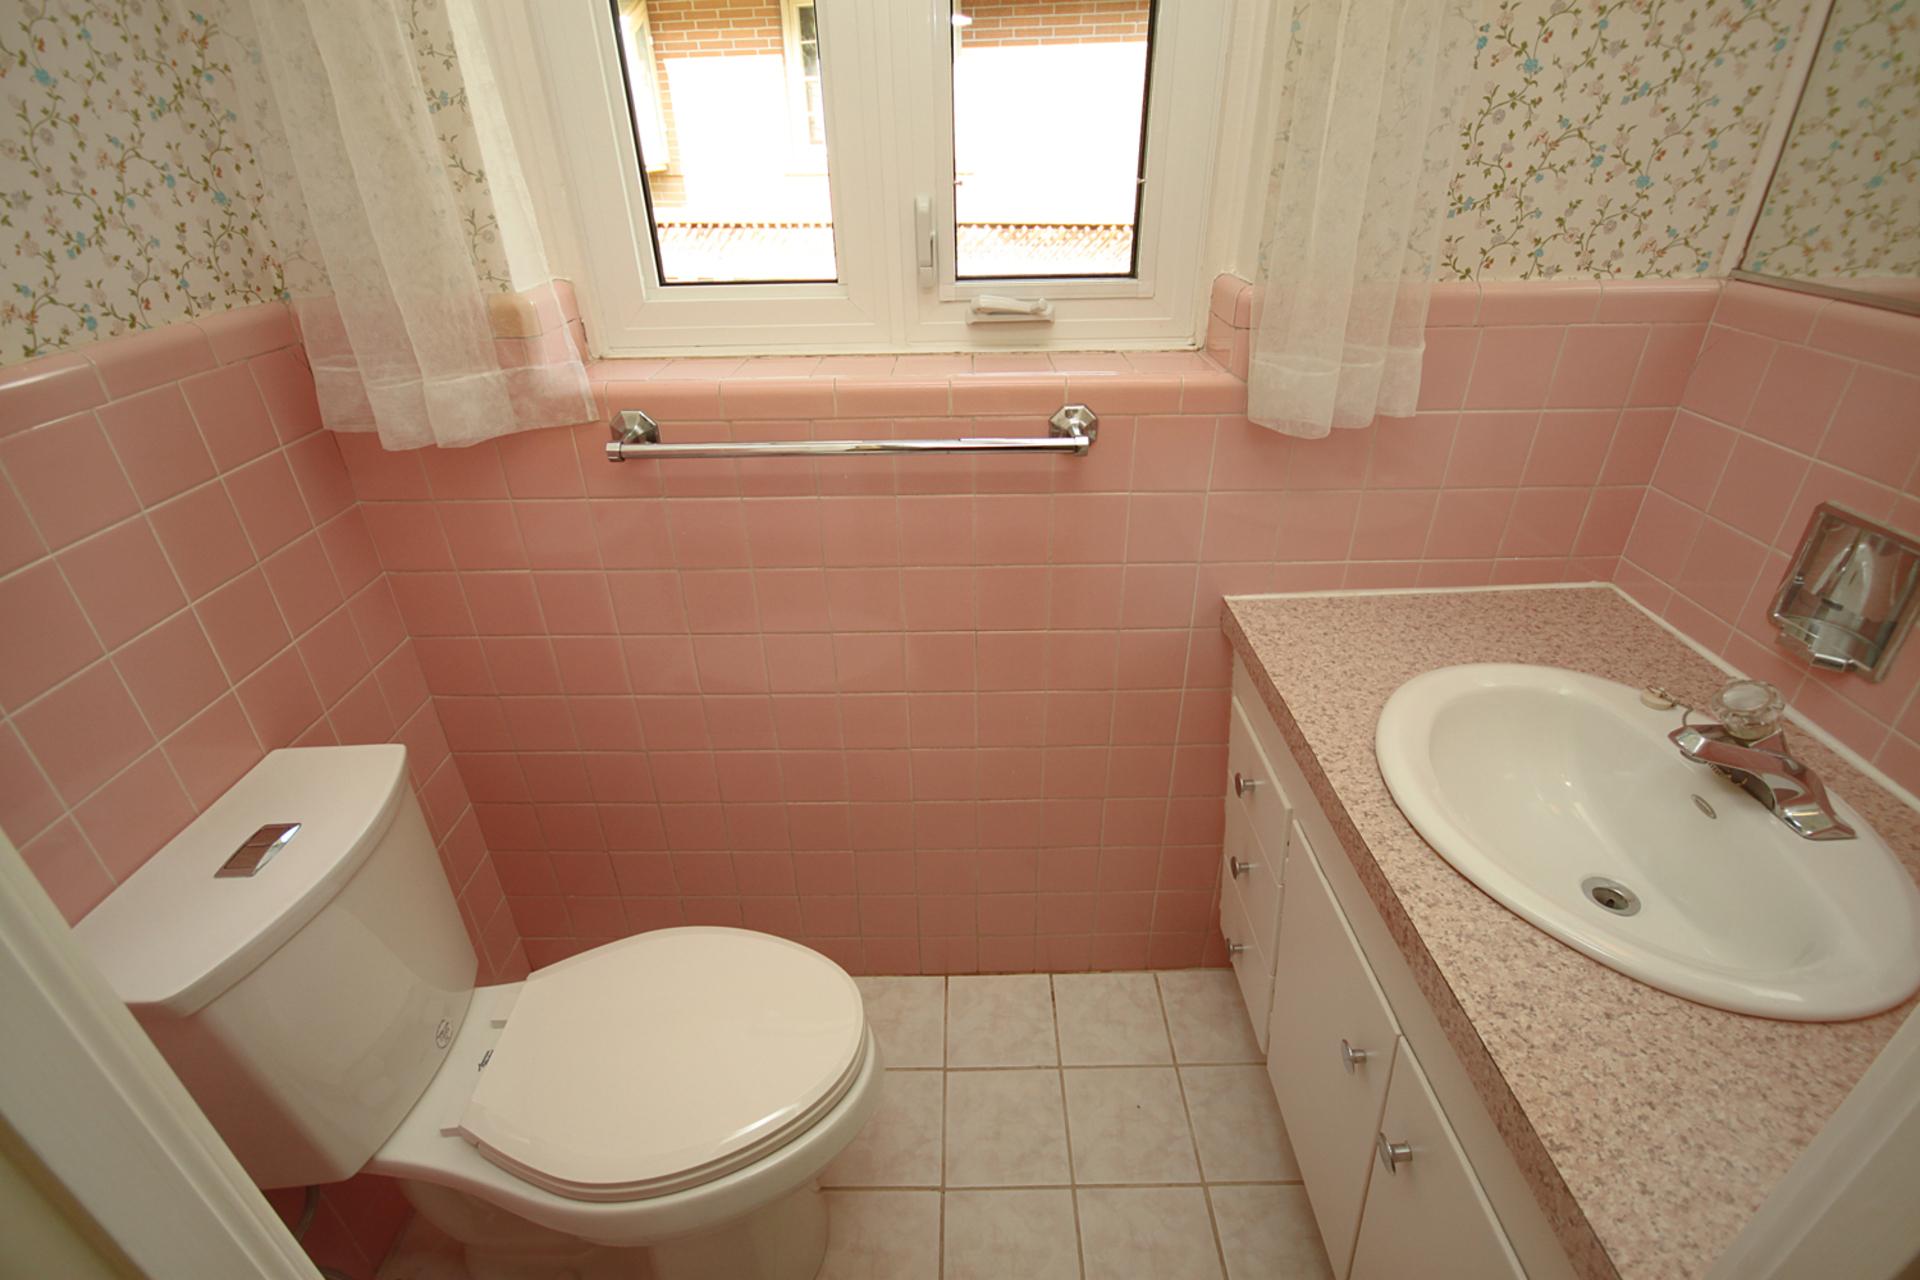 2 Piece Ensuite Bathroom at 29 Groveland Crescent, Parkwoods-Donalda, Toronto